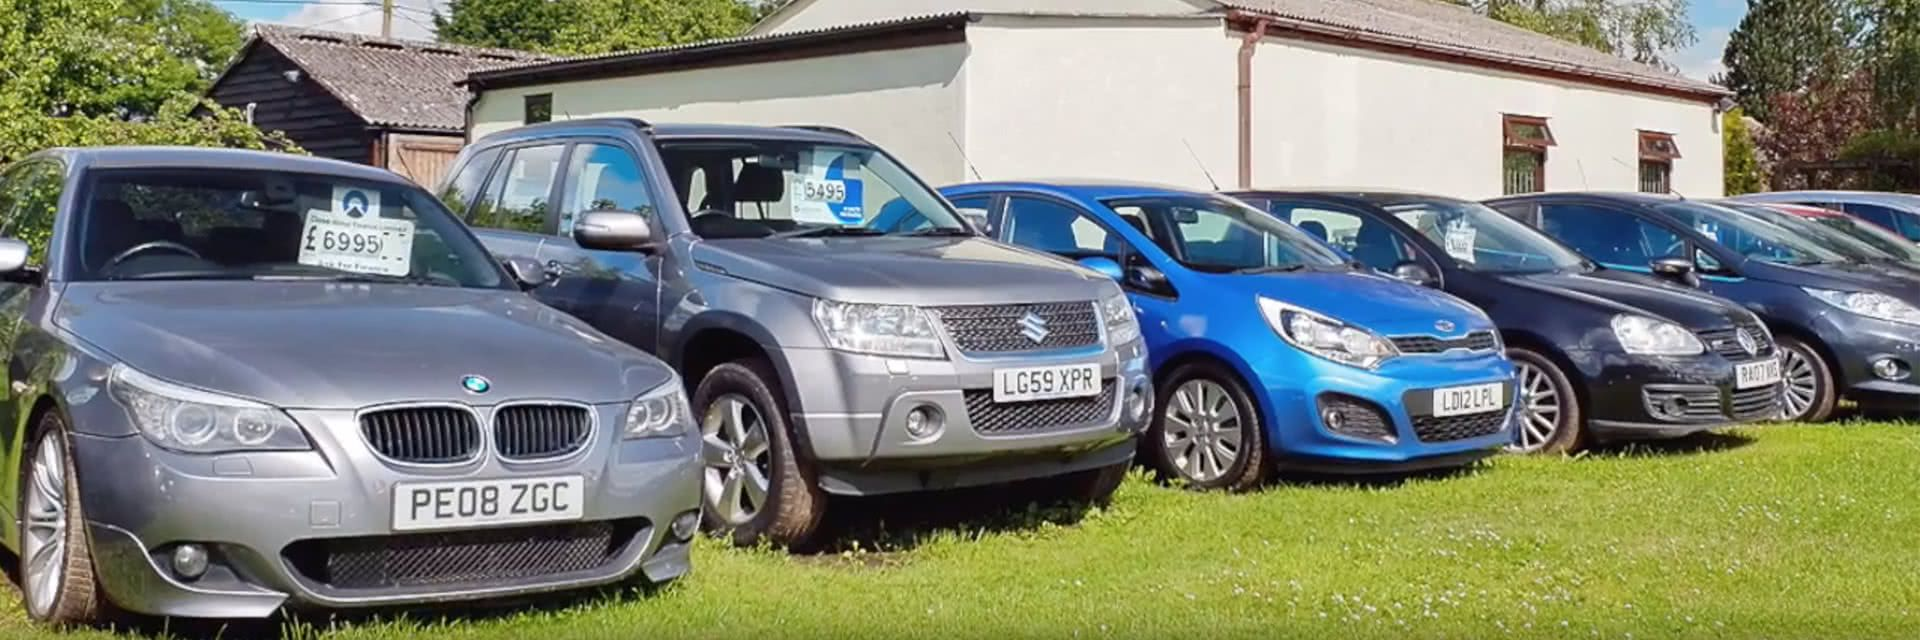 Online Used Car Dealer Stockport Used cars, Stockport